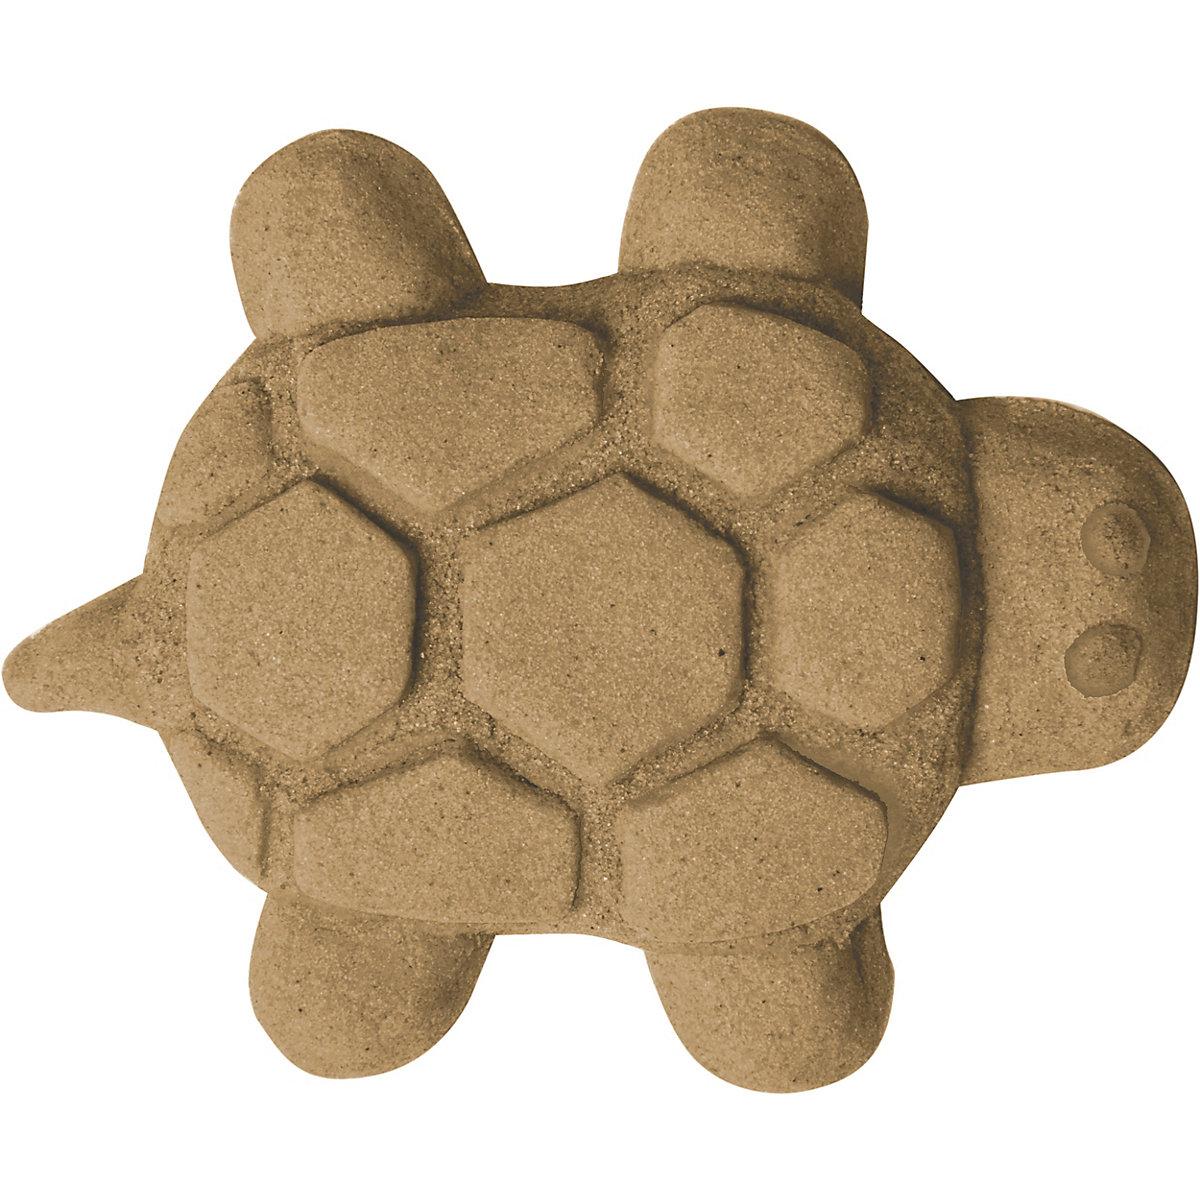 Kinetic Sand braun 907 g Beutel Kinetic Sand 6ax4p